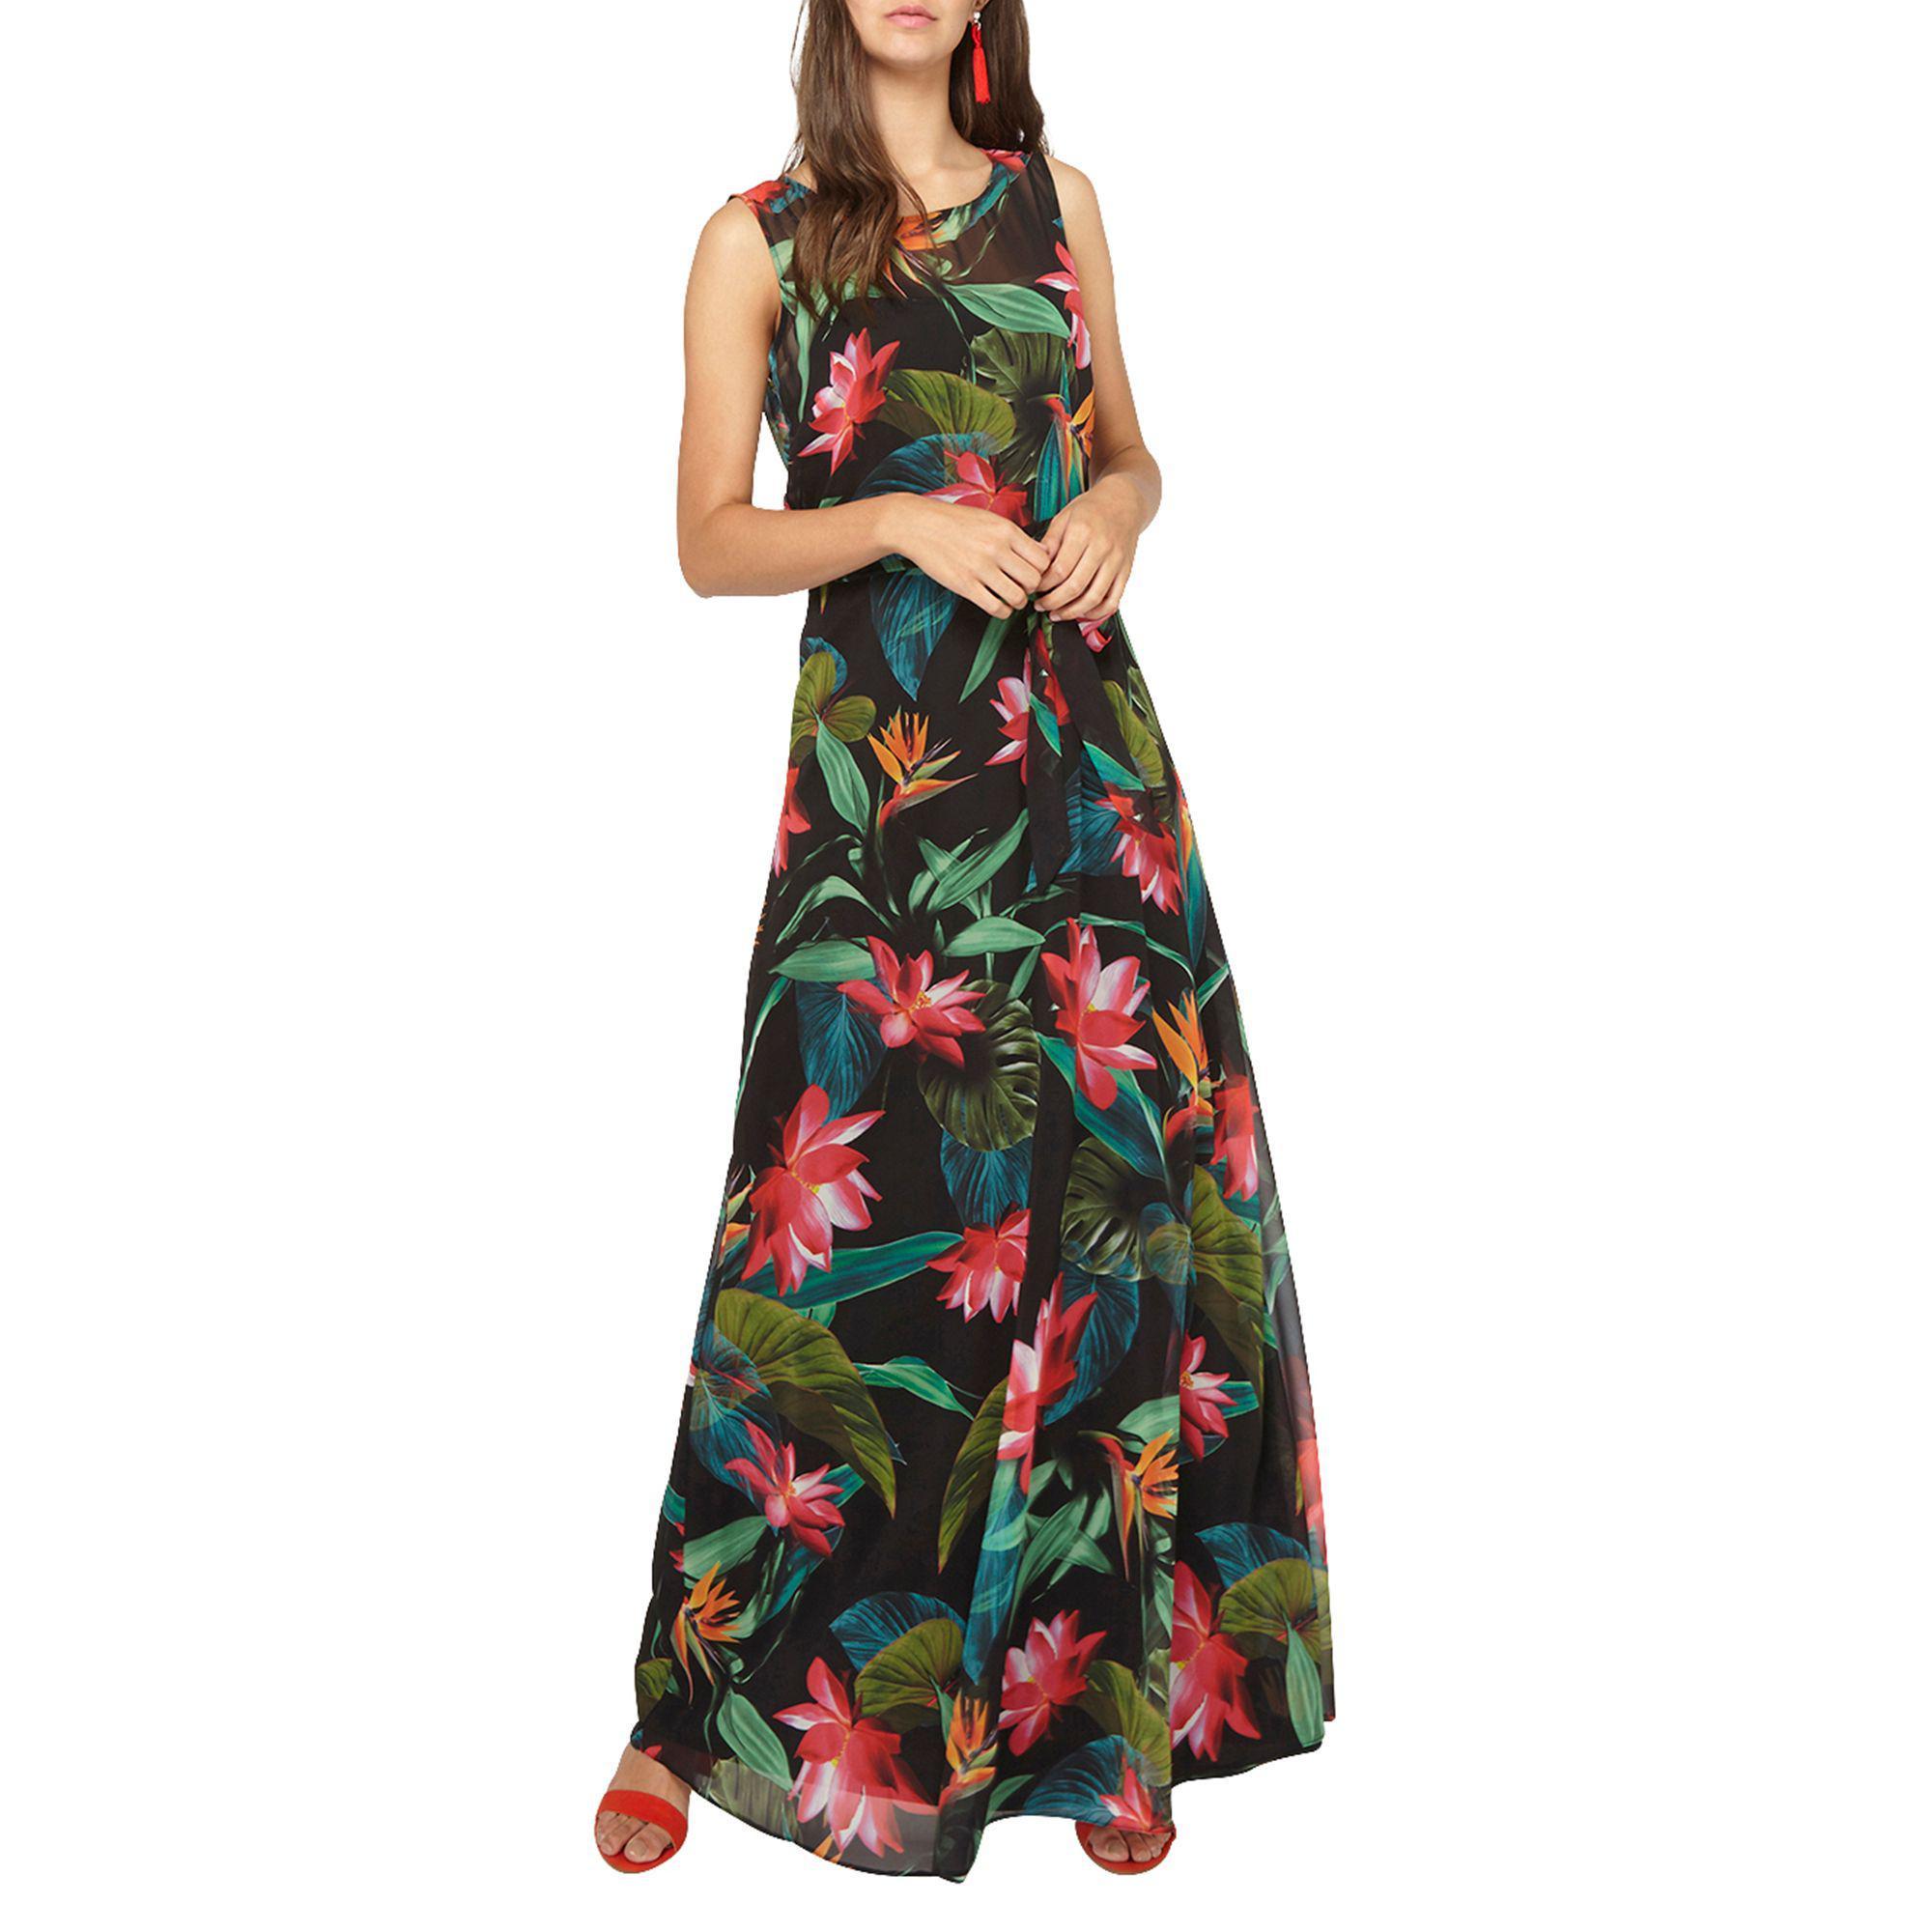 6c0263c249 Dorothy Perkins Billie   Blossom Tall Black Tropical Print Maxi ...